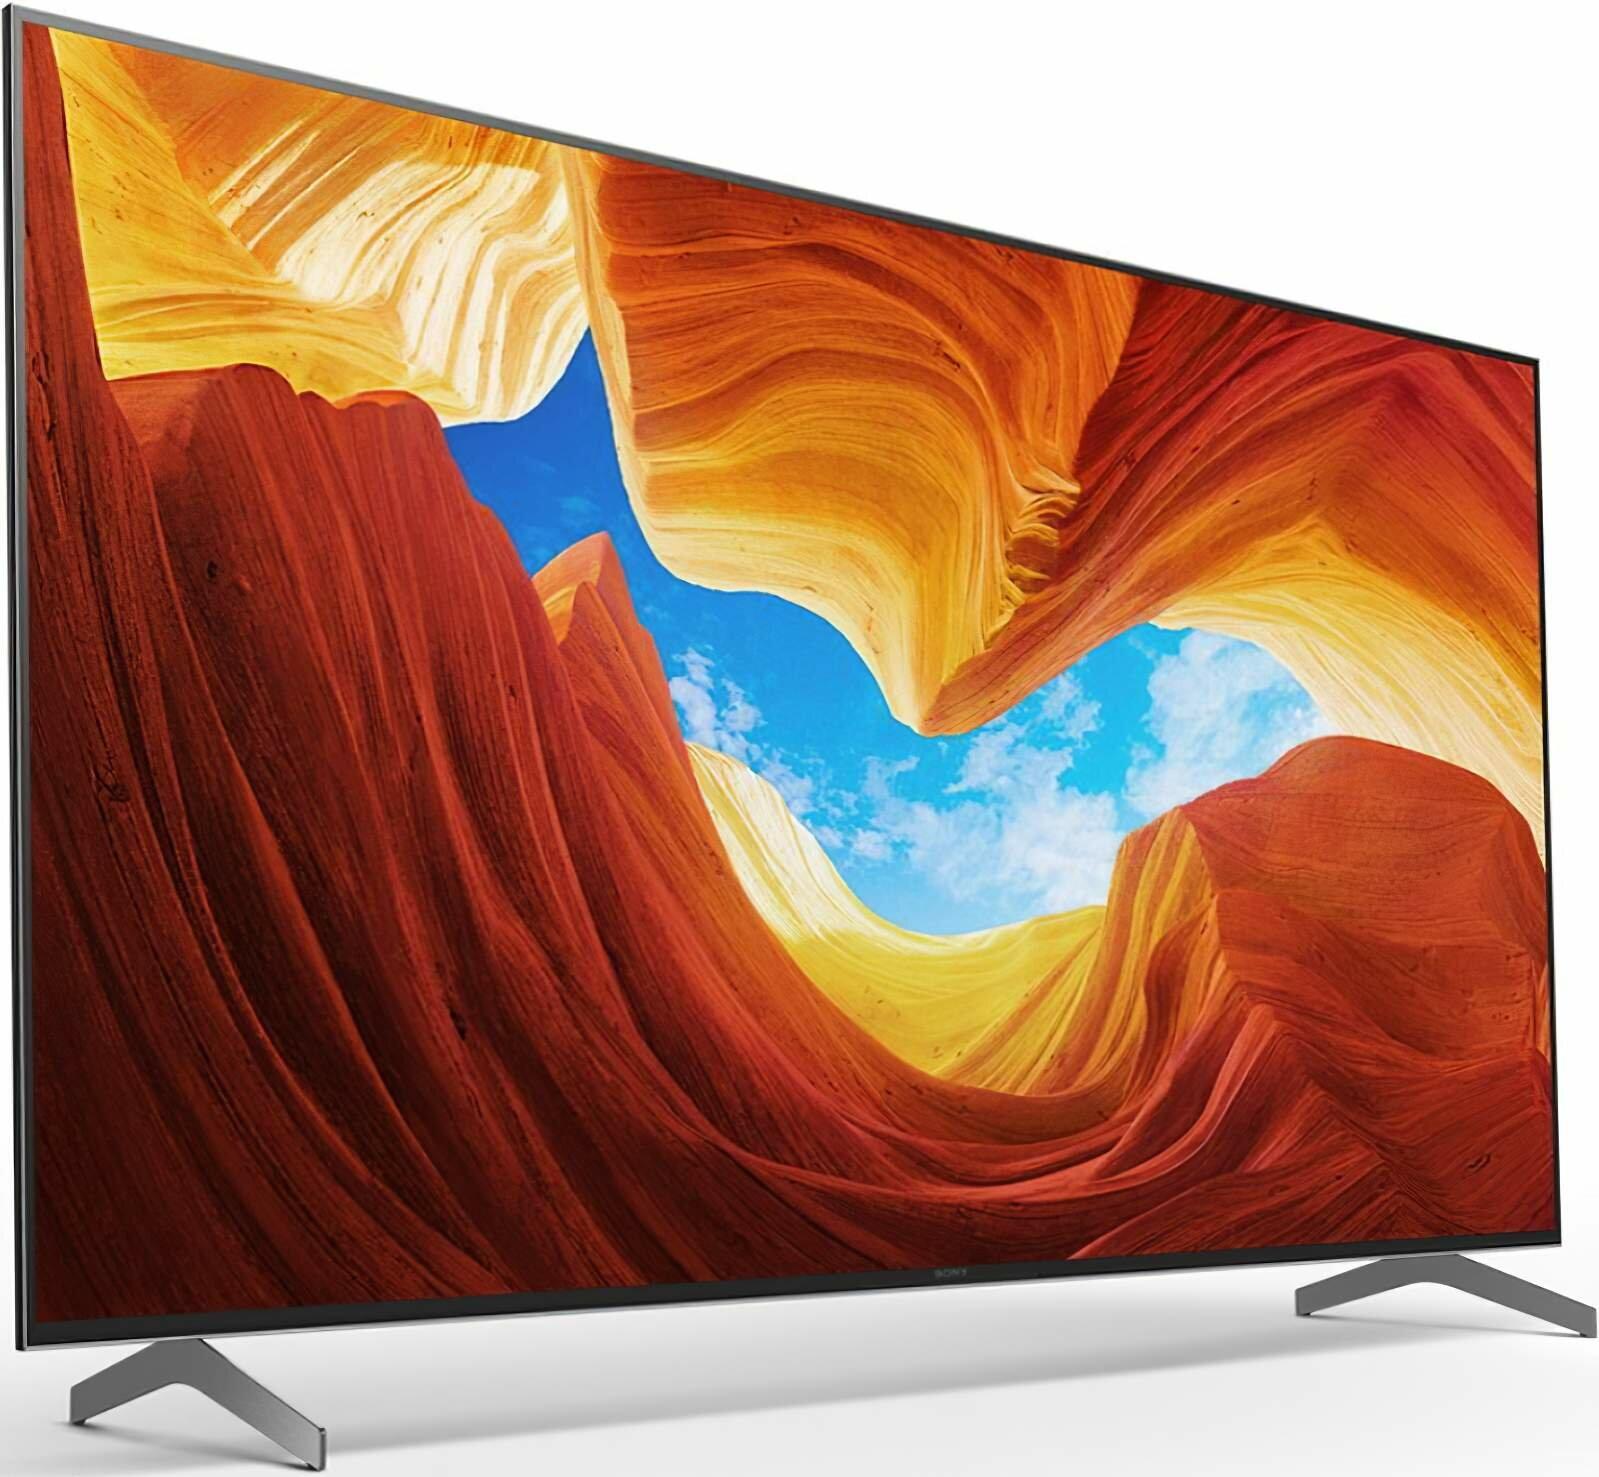 "Telewizor SONY KE85XH9096BAEP 85"" LED 4K 120Hz Android TV HDMI 2.1 Nowość 2021"